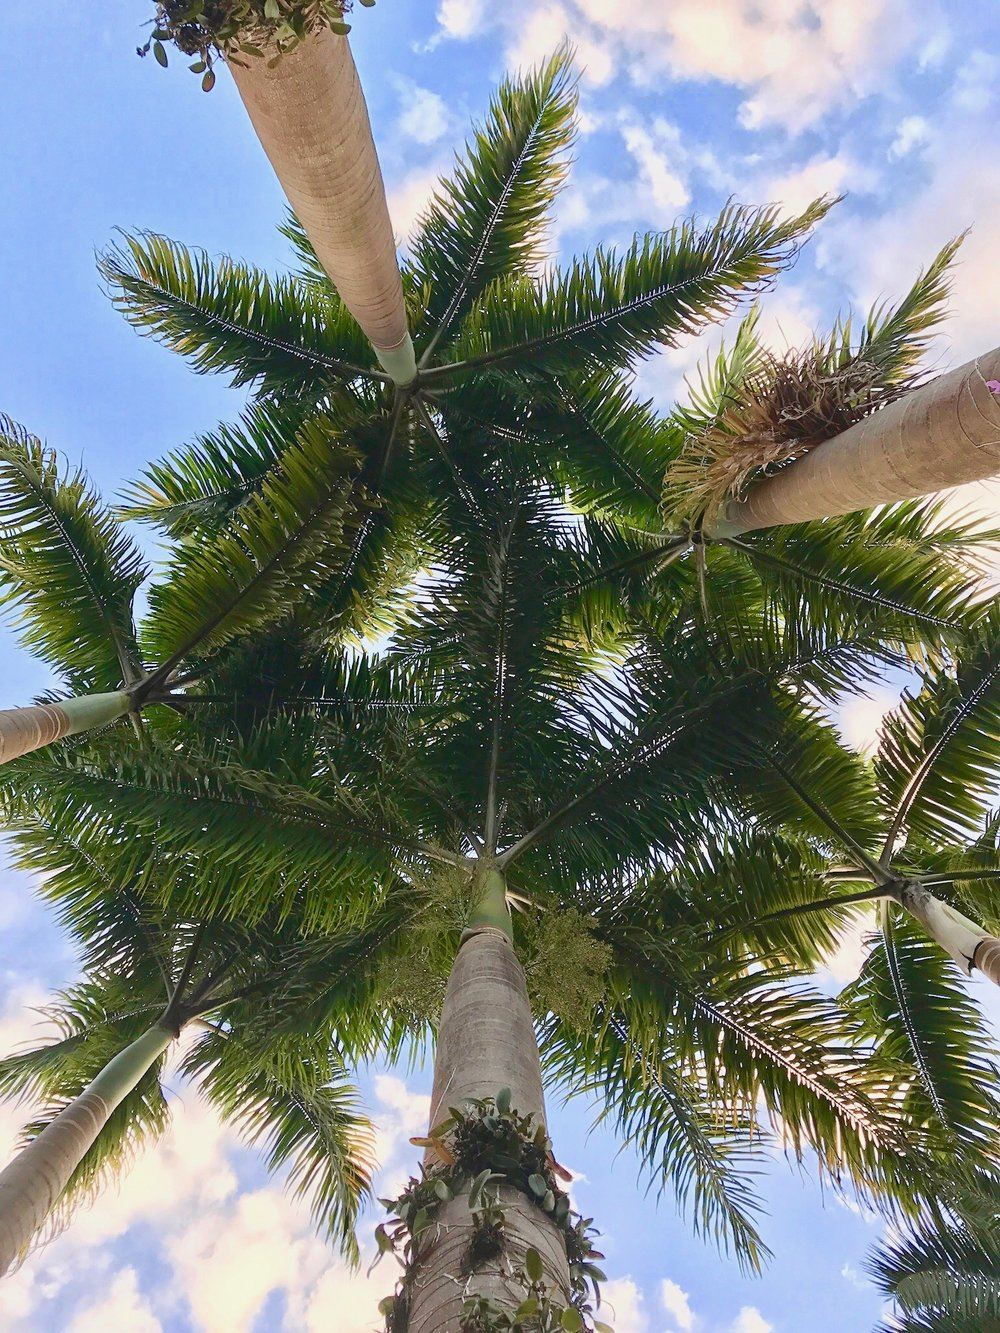 Inhotim Palm Trees